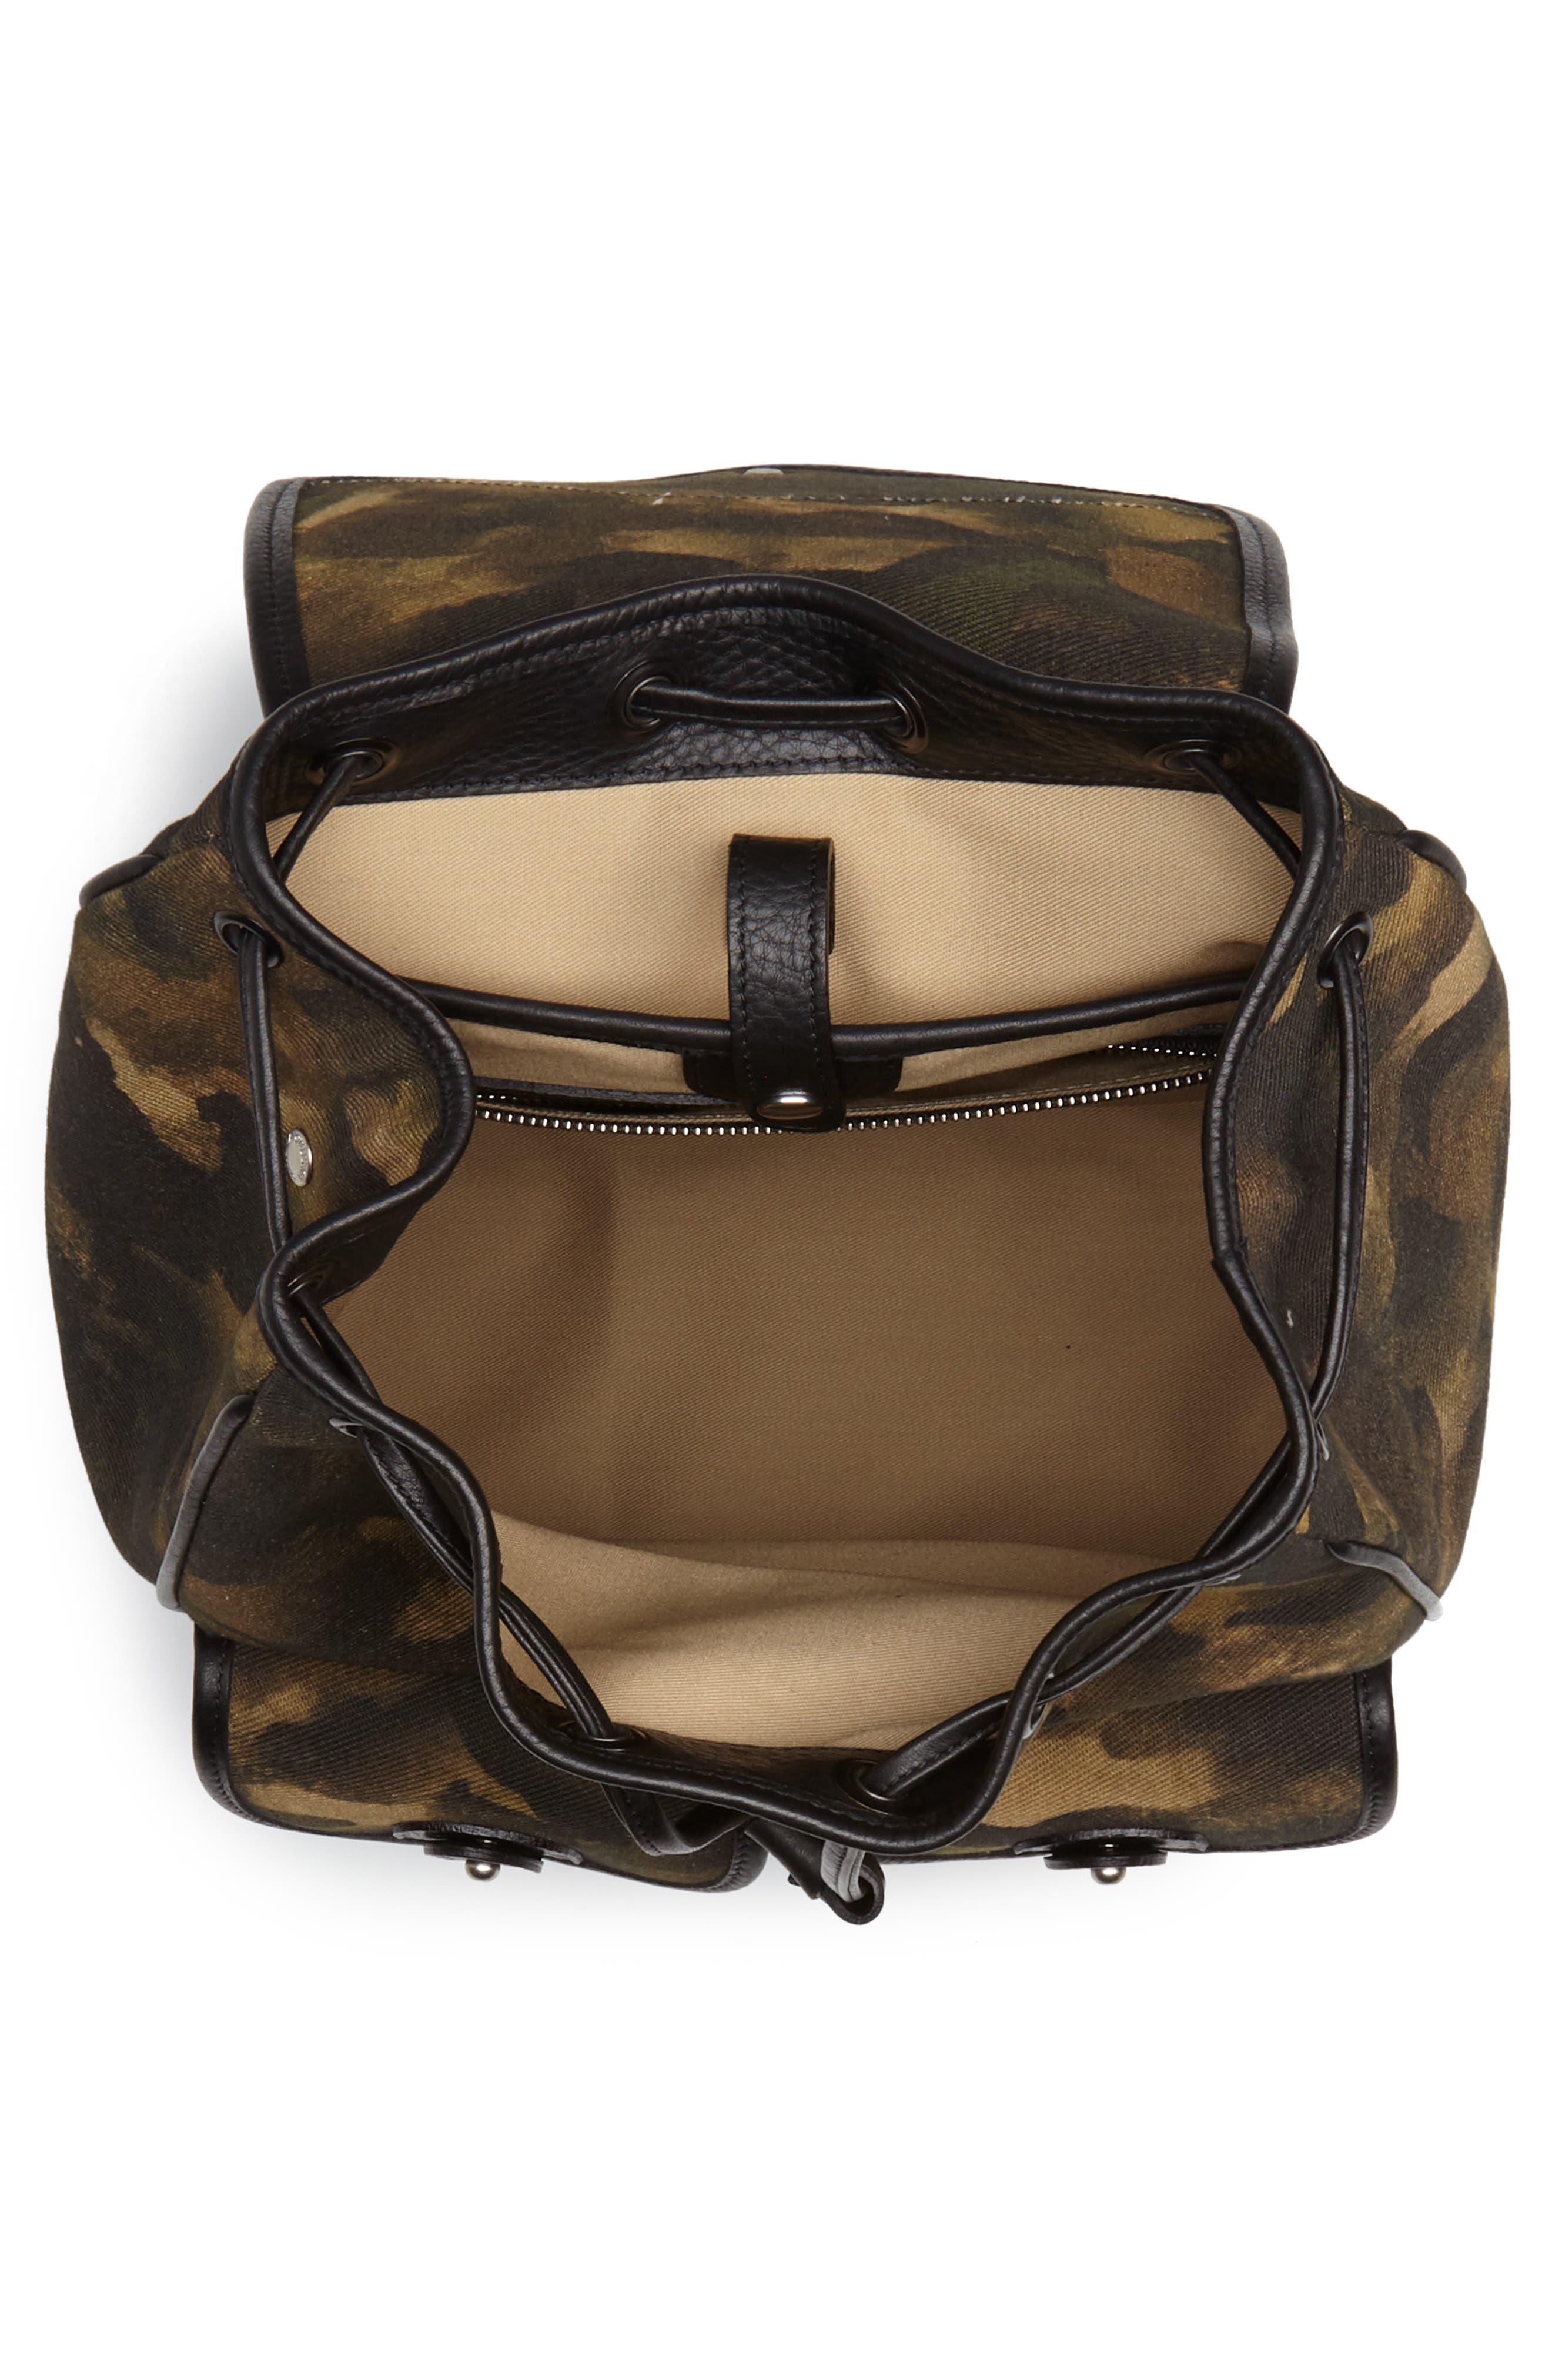 Blazer Canvas Backpack,                             Alternate thumbnail 4, color,                             350